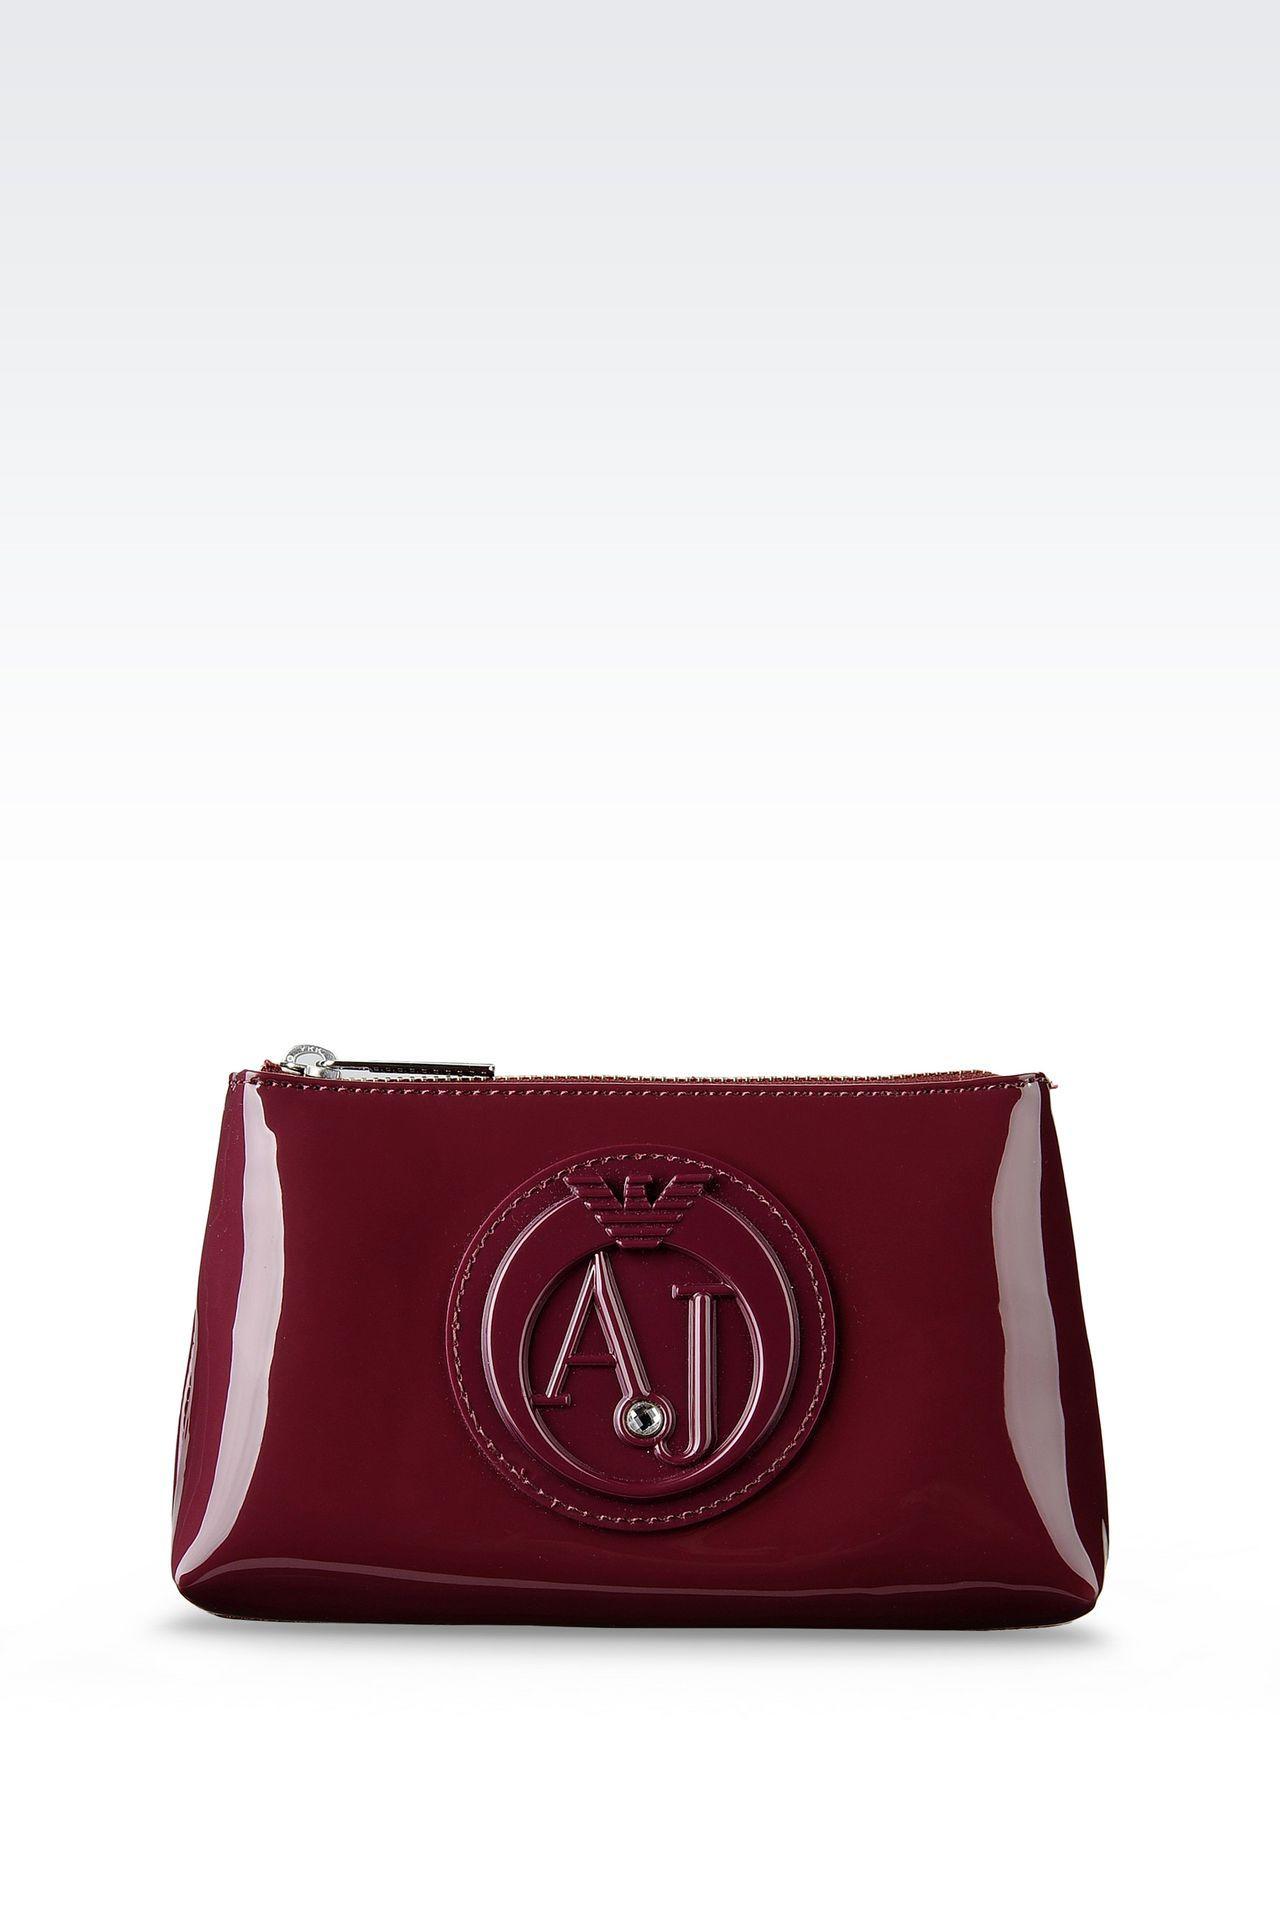 Armani Jeans Women Beauty Case - ECO PATENT LEATHER BEAUTY CASE WITH LOGO Armani  Jeans Official 8a659027c95ed